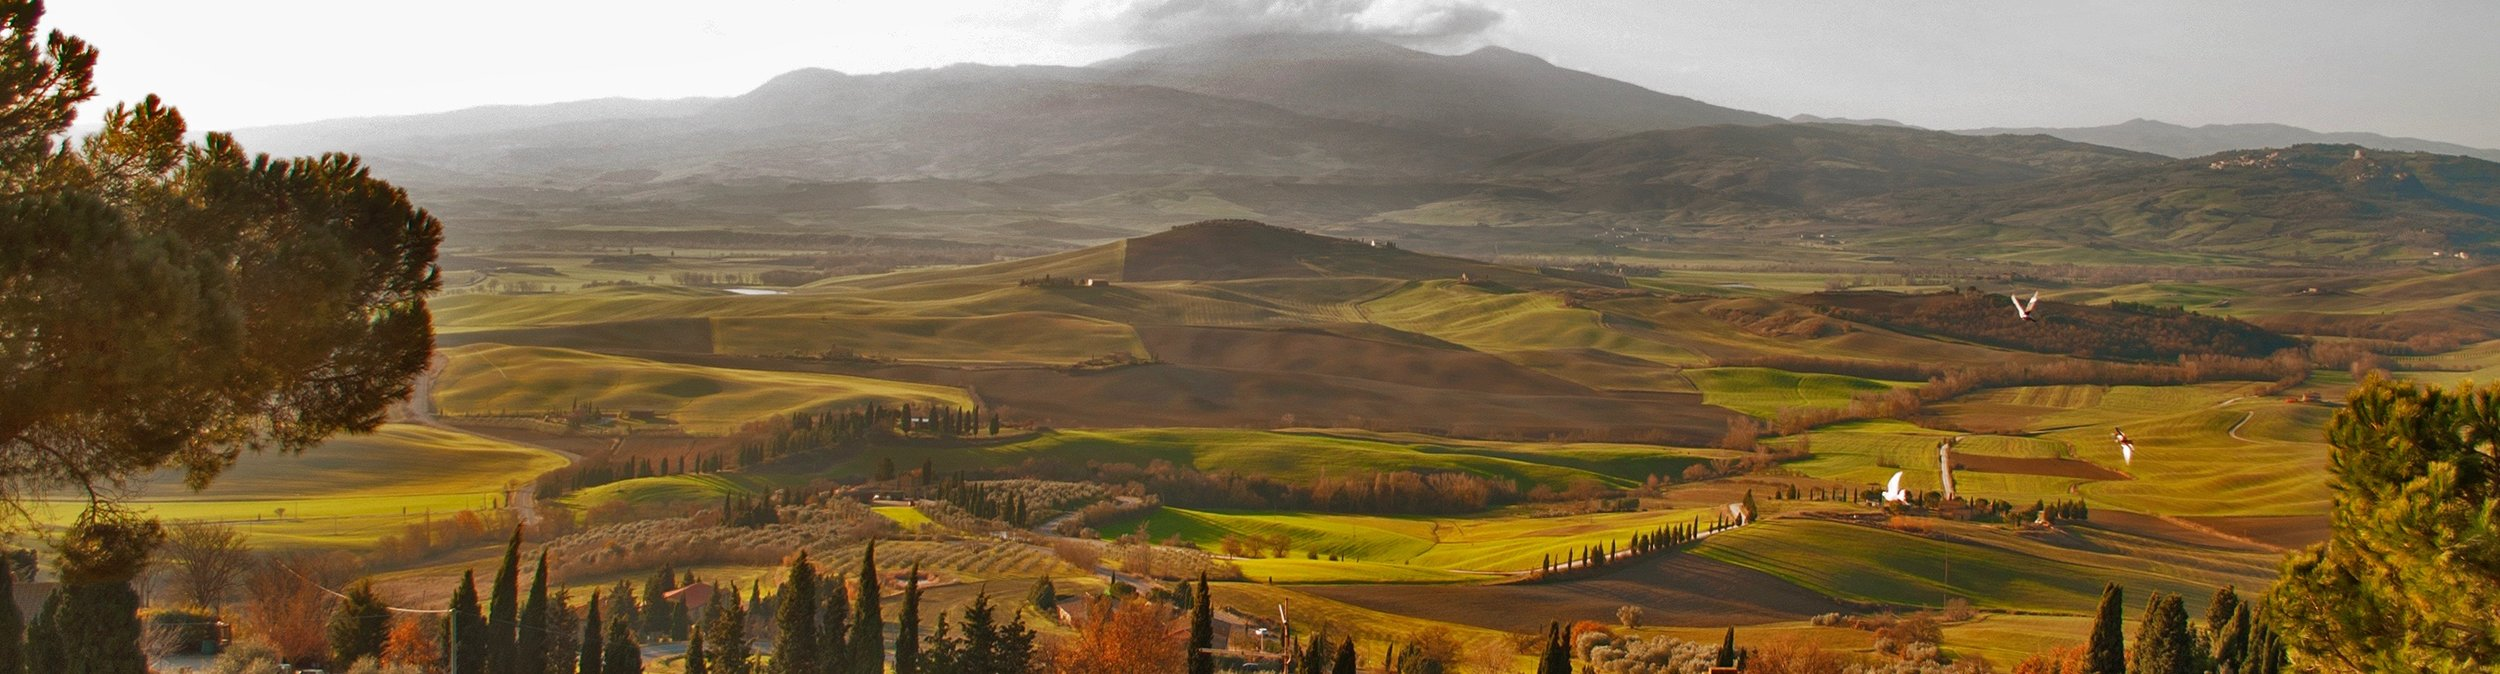 Linnell Pienza panorama.jpg